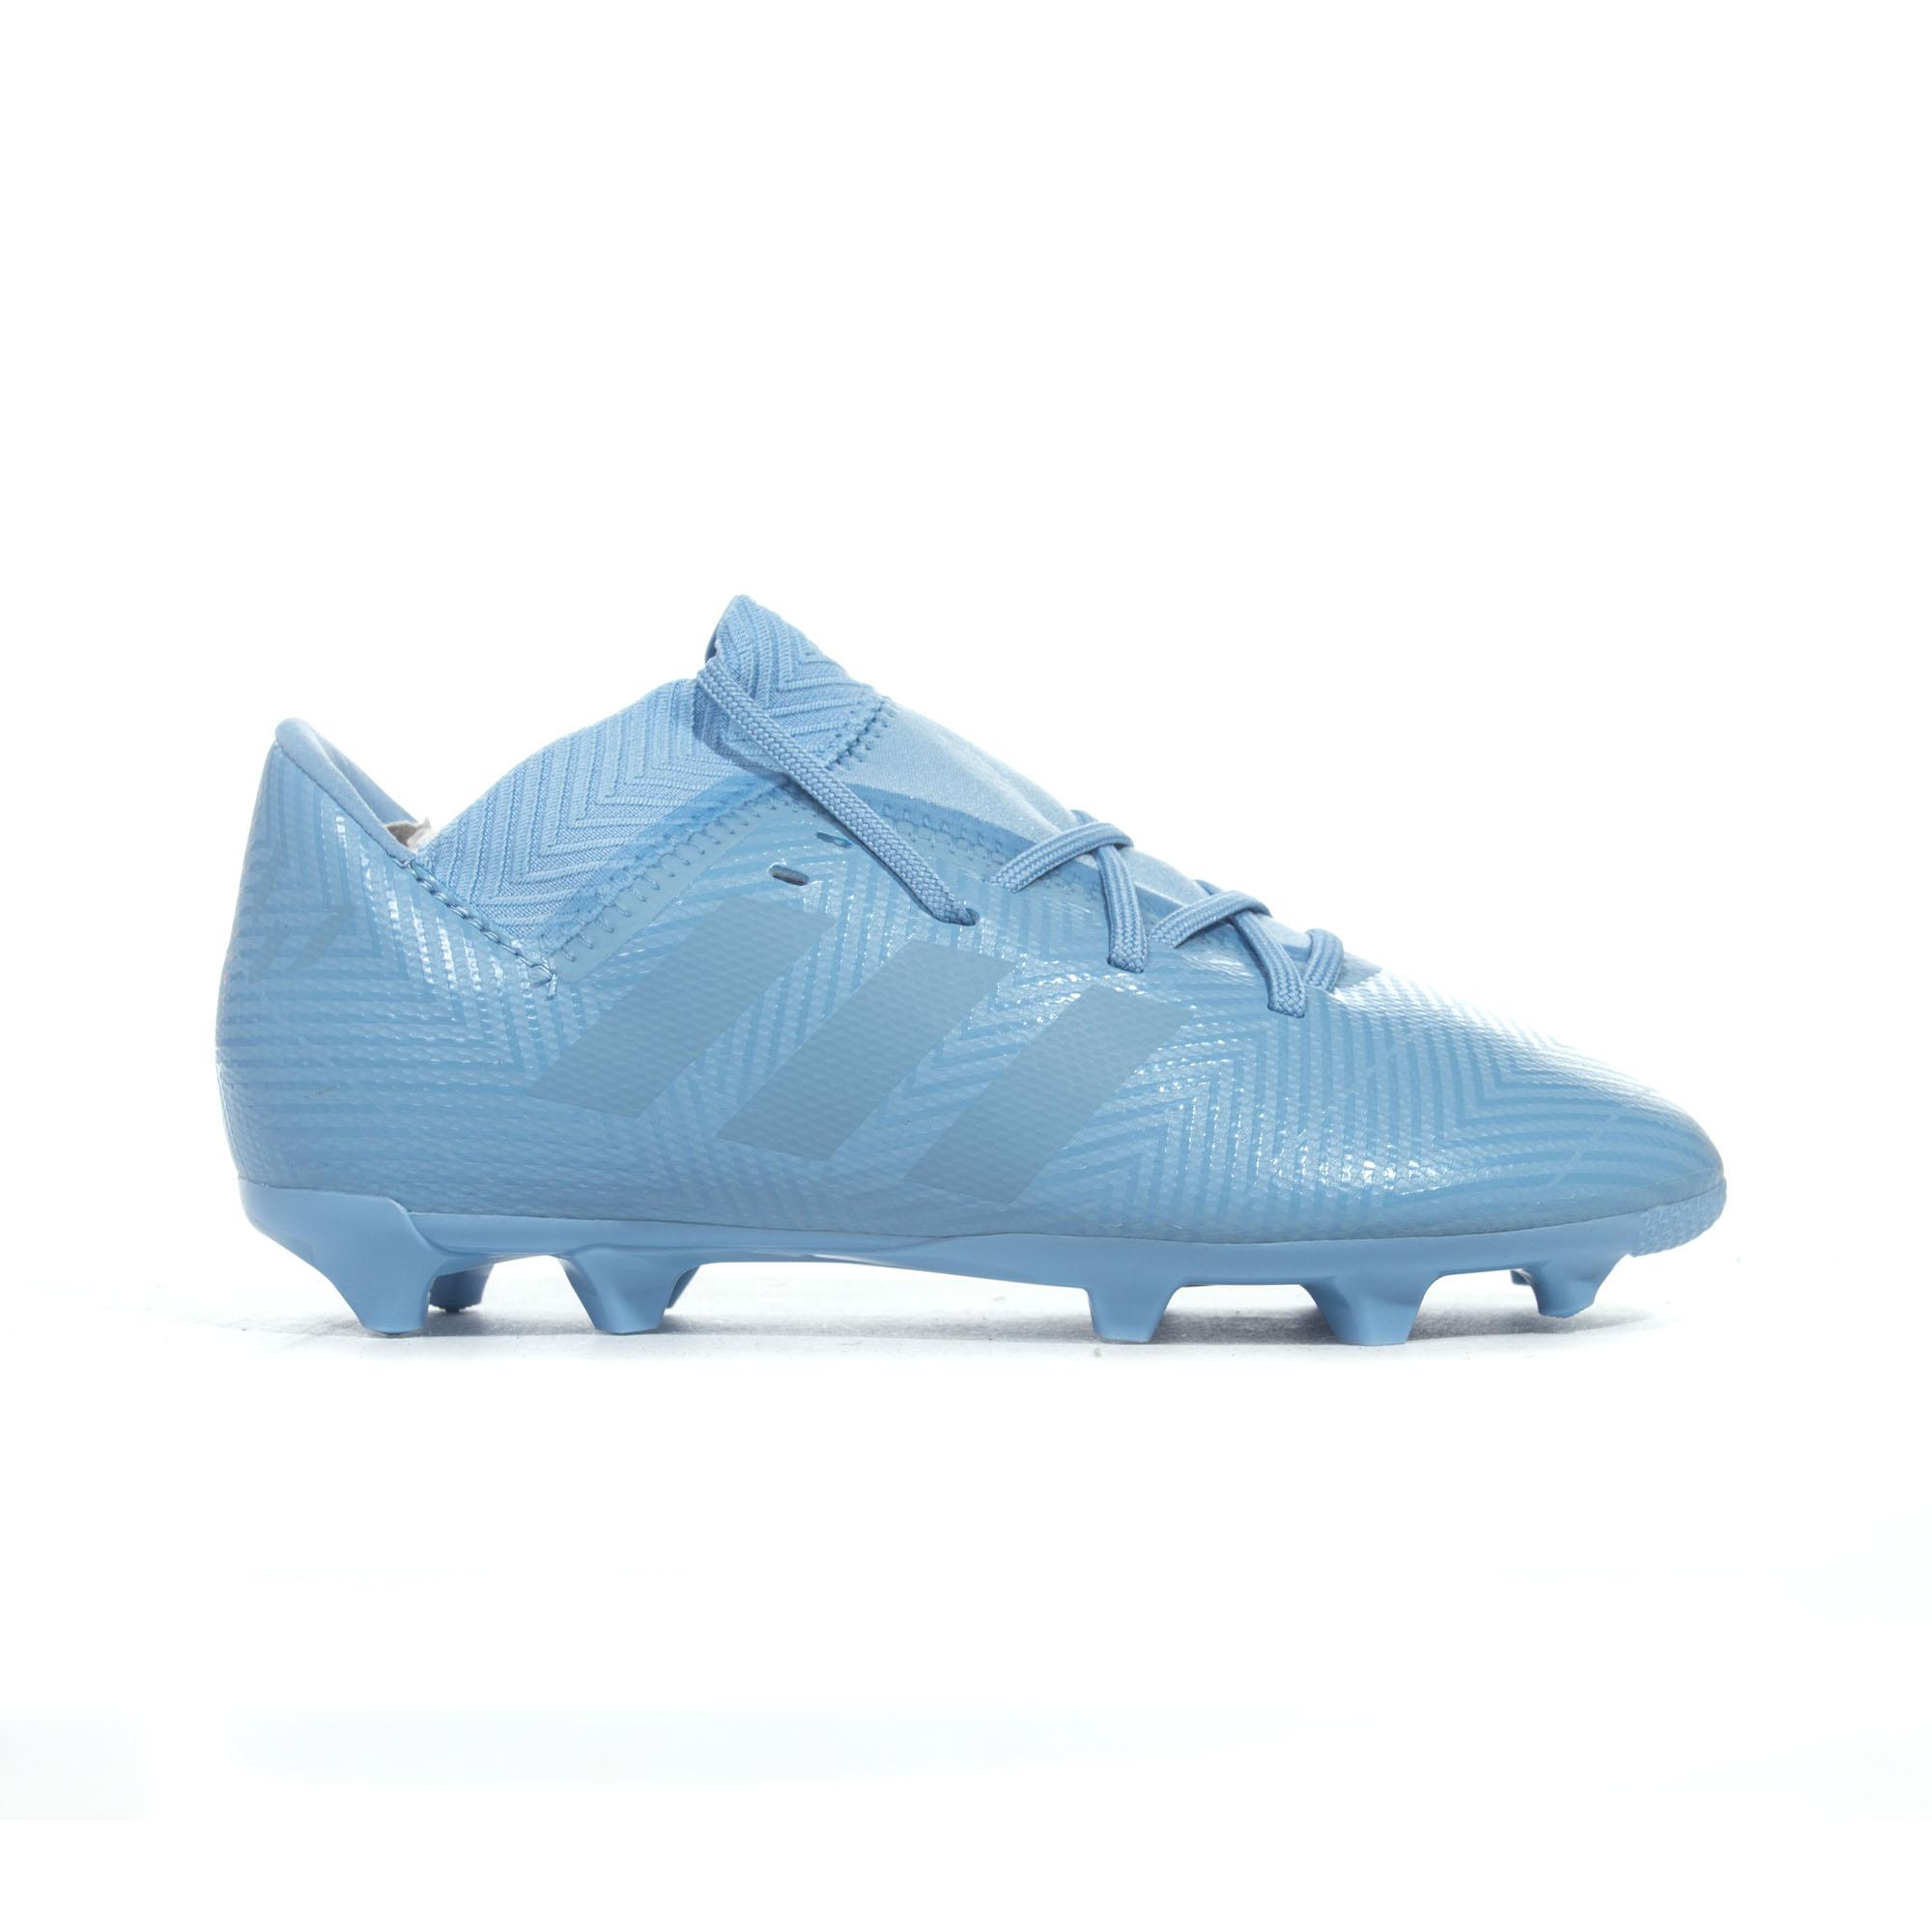 the latest 1f2d4 285a5 Details about adidas Nemeziz Messi 18.3 FG Firm Ground Kids Football Soccer  Boot Spectral Mode